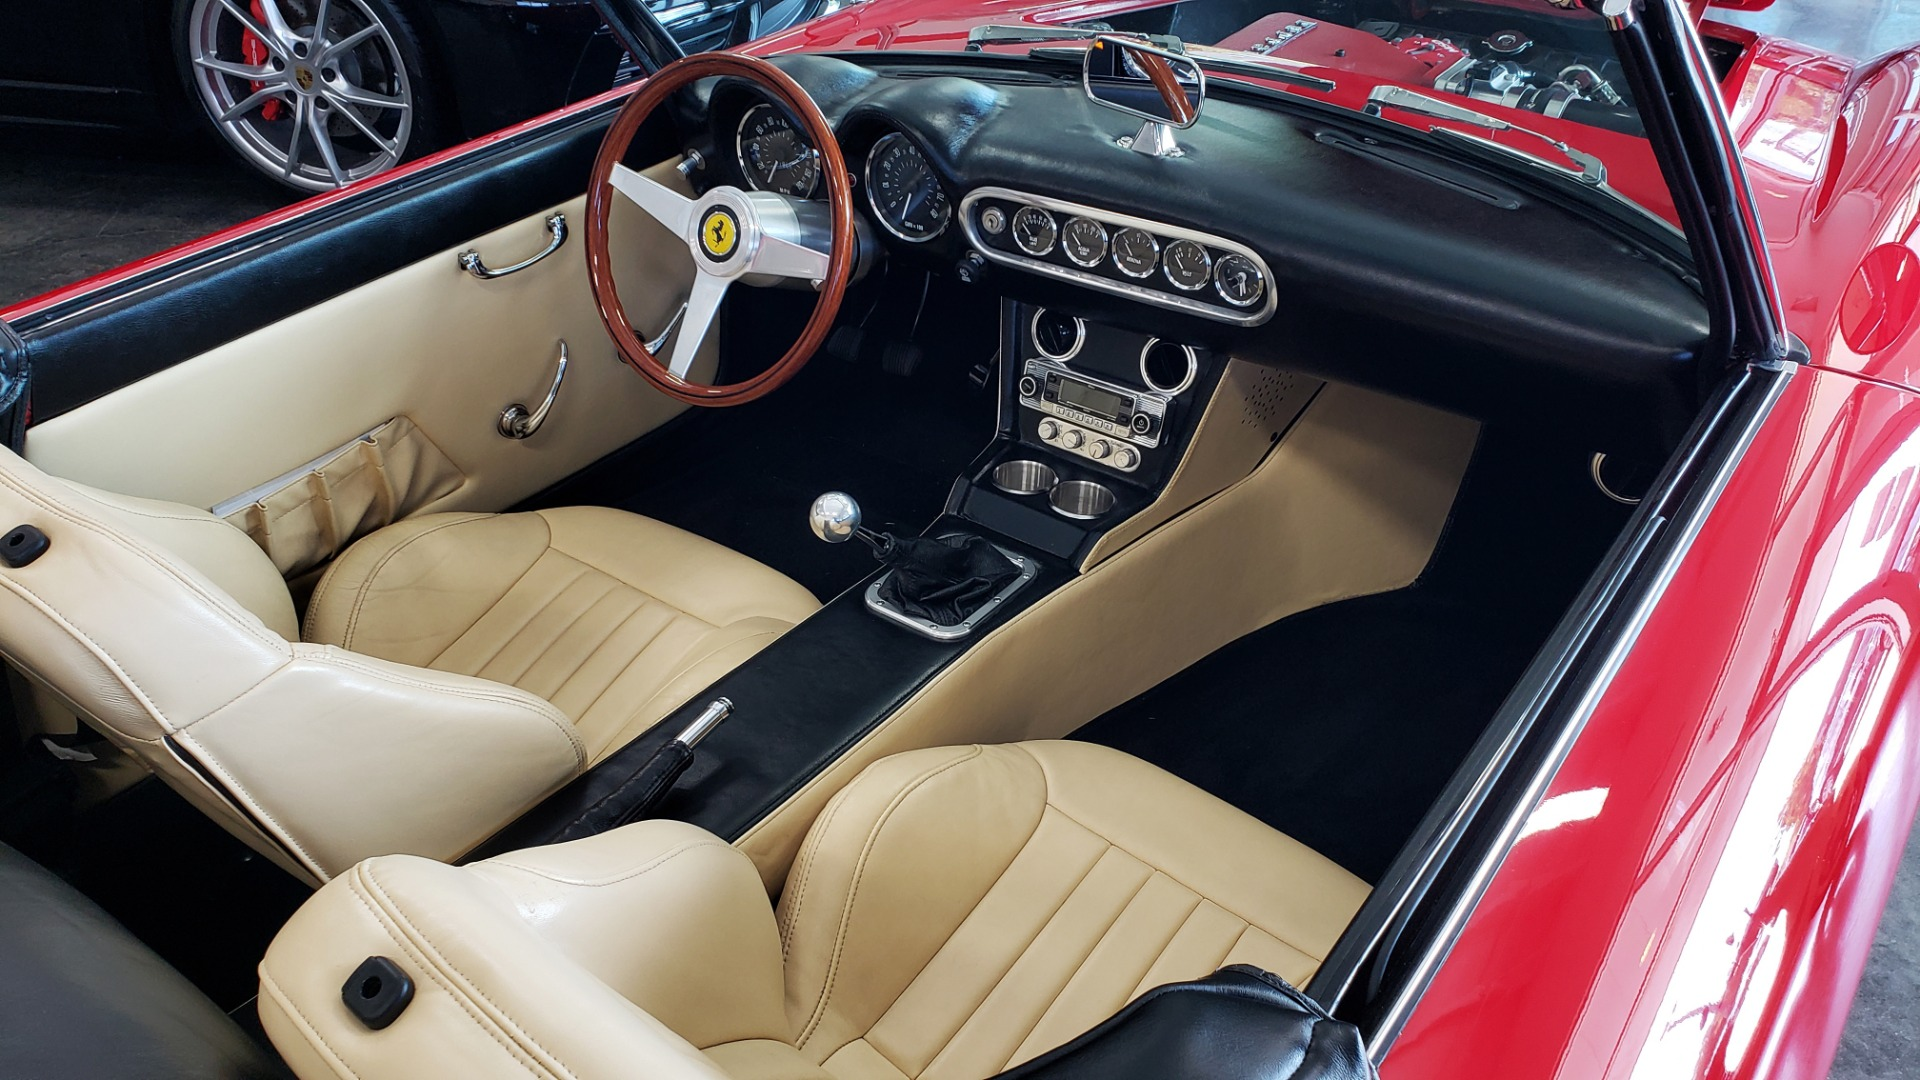 Used 1961 Ferrari 250GT SWB CALIFORNIA REPLICA / 302CI V8 / TREMEC 5-SPEED for sale Sold at Formula Imports in Charlotte NC 28227 75